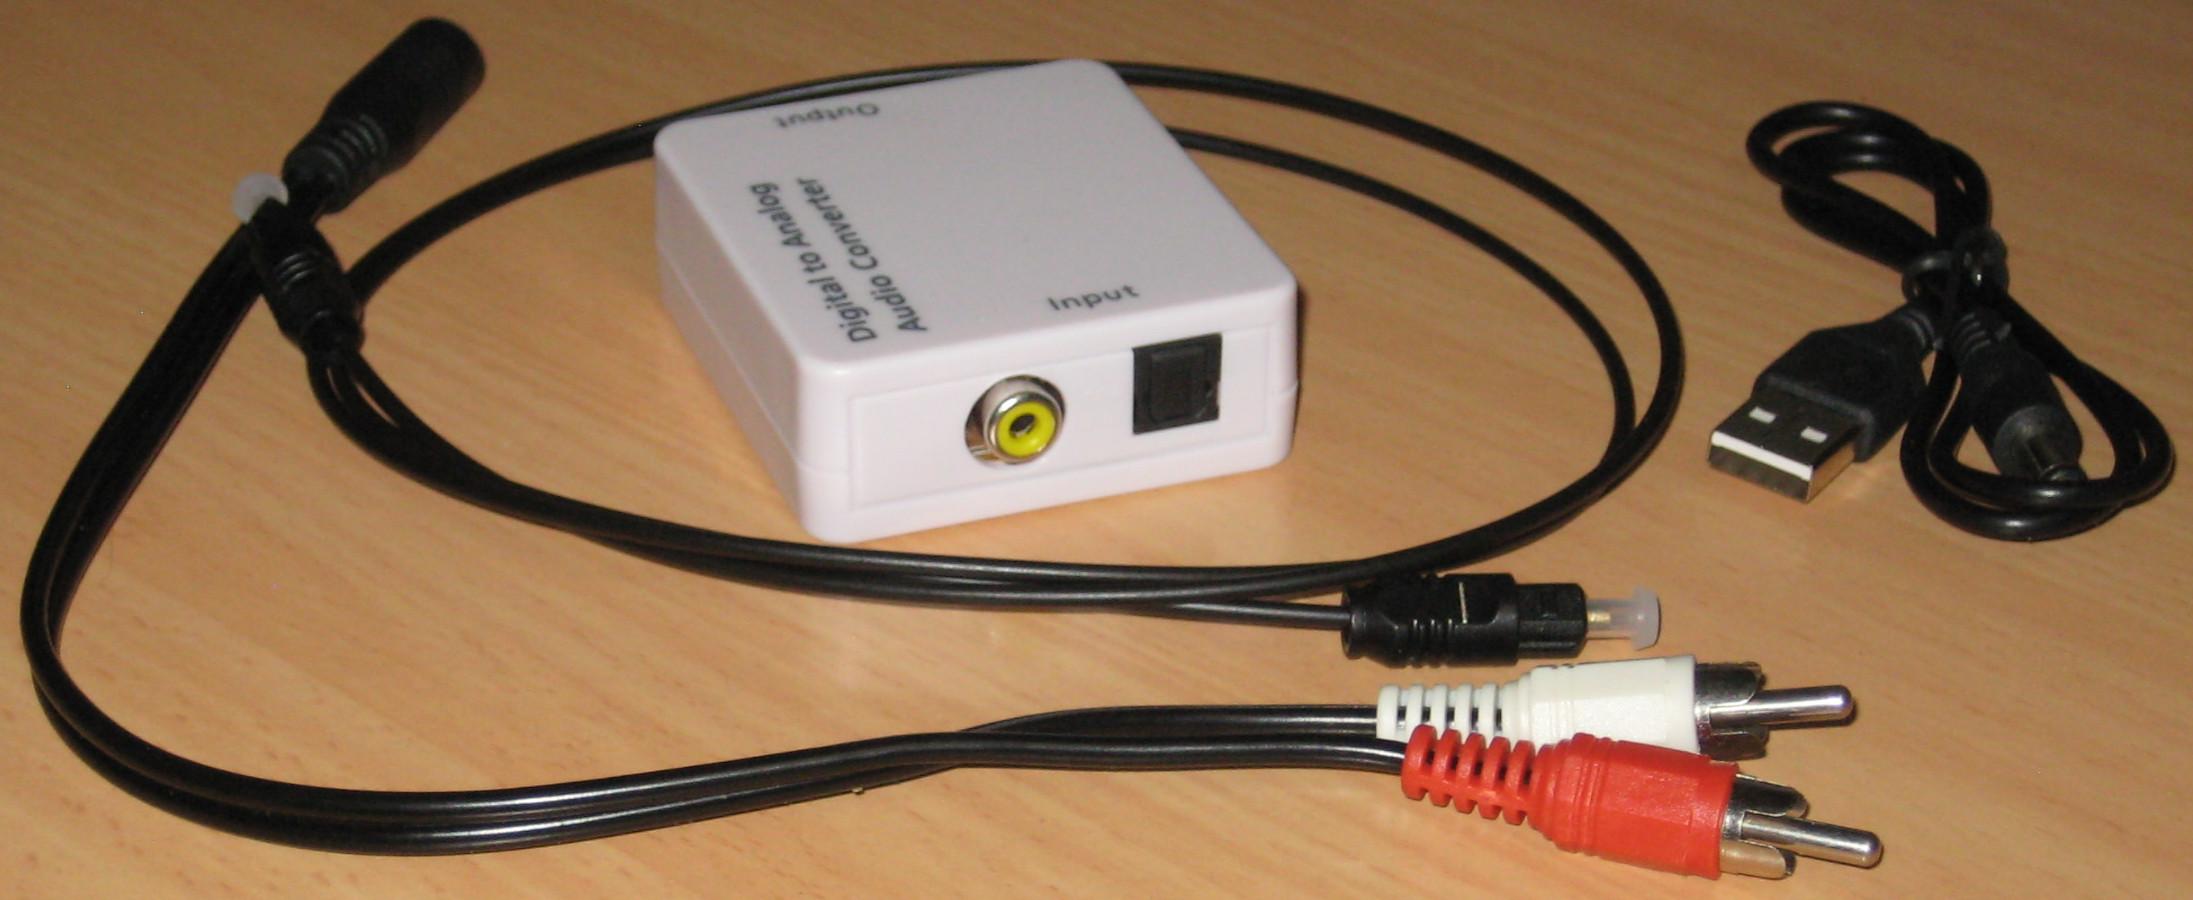 Https About Grenvillefileswordpress Usb To Serial Circuitjpg Toslinkrca Lead 1